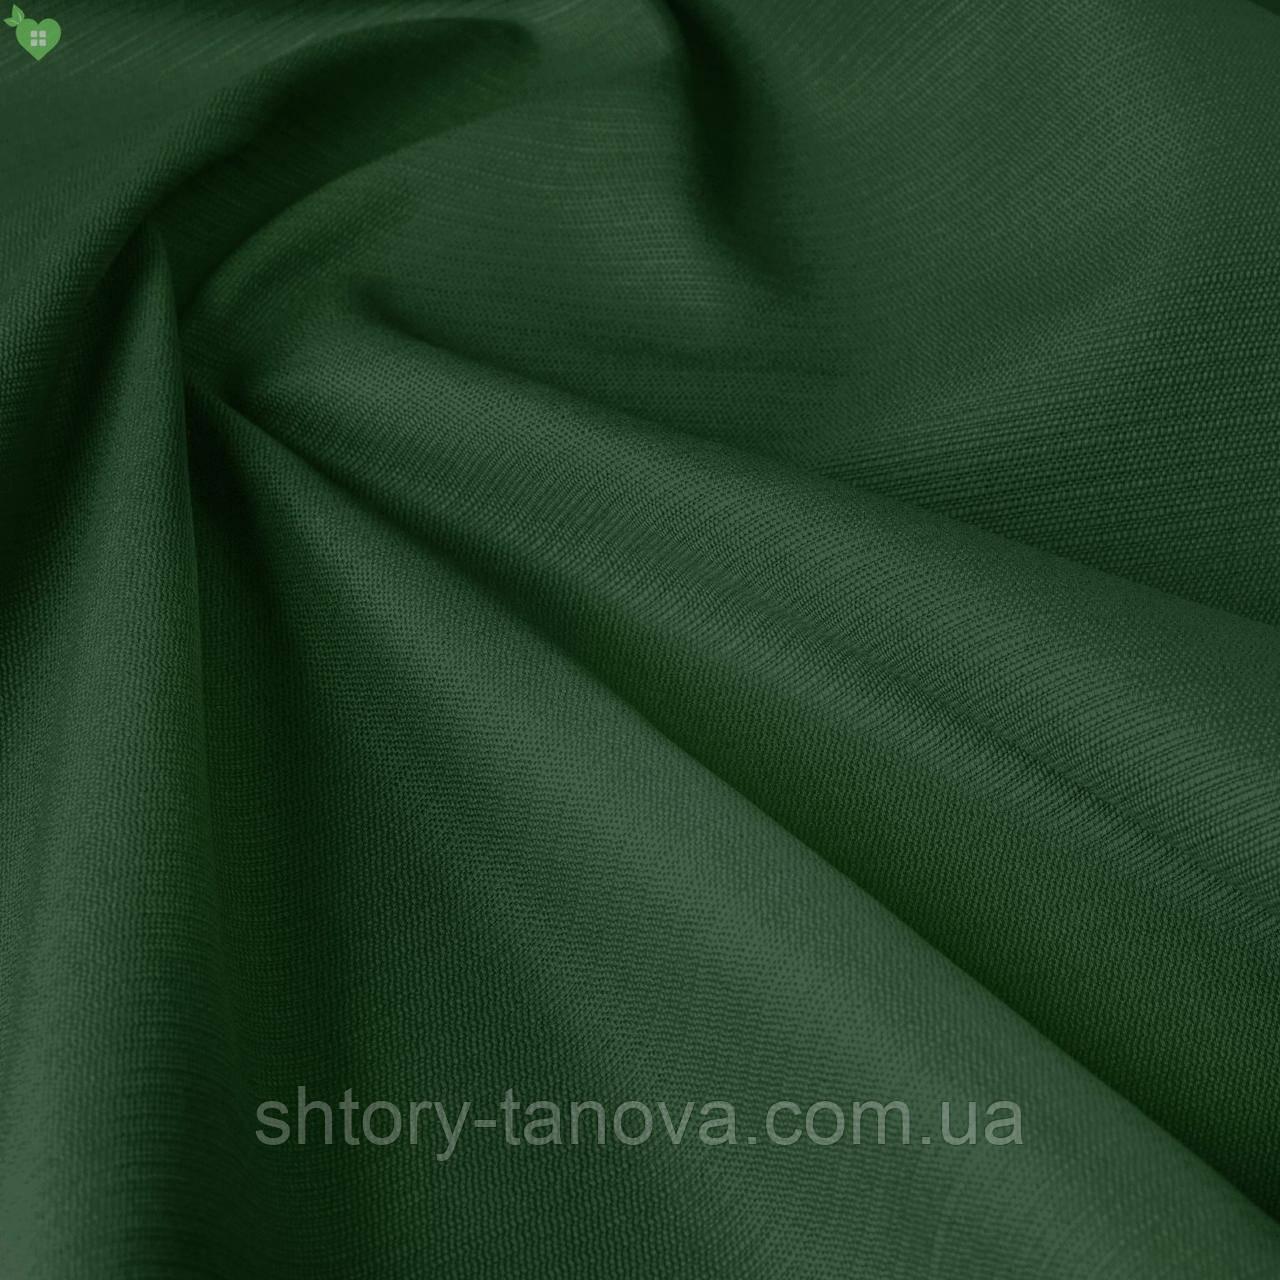 Вулична тканина з фактурою зеленого кольору для тераси